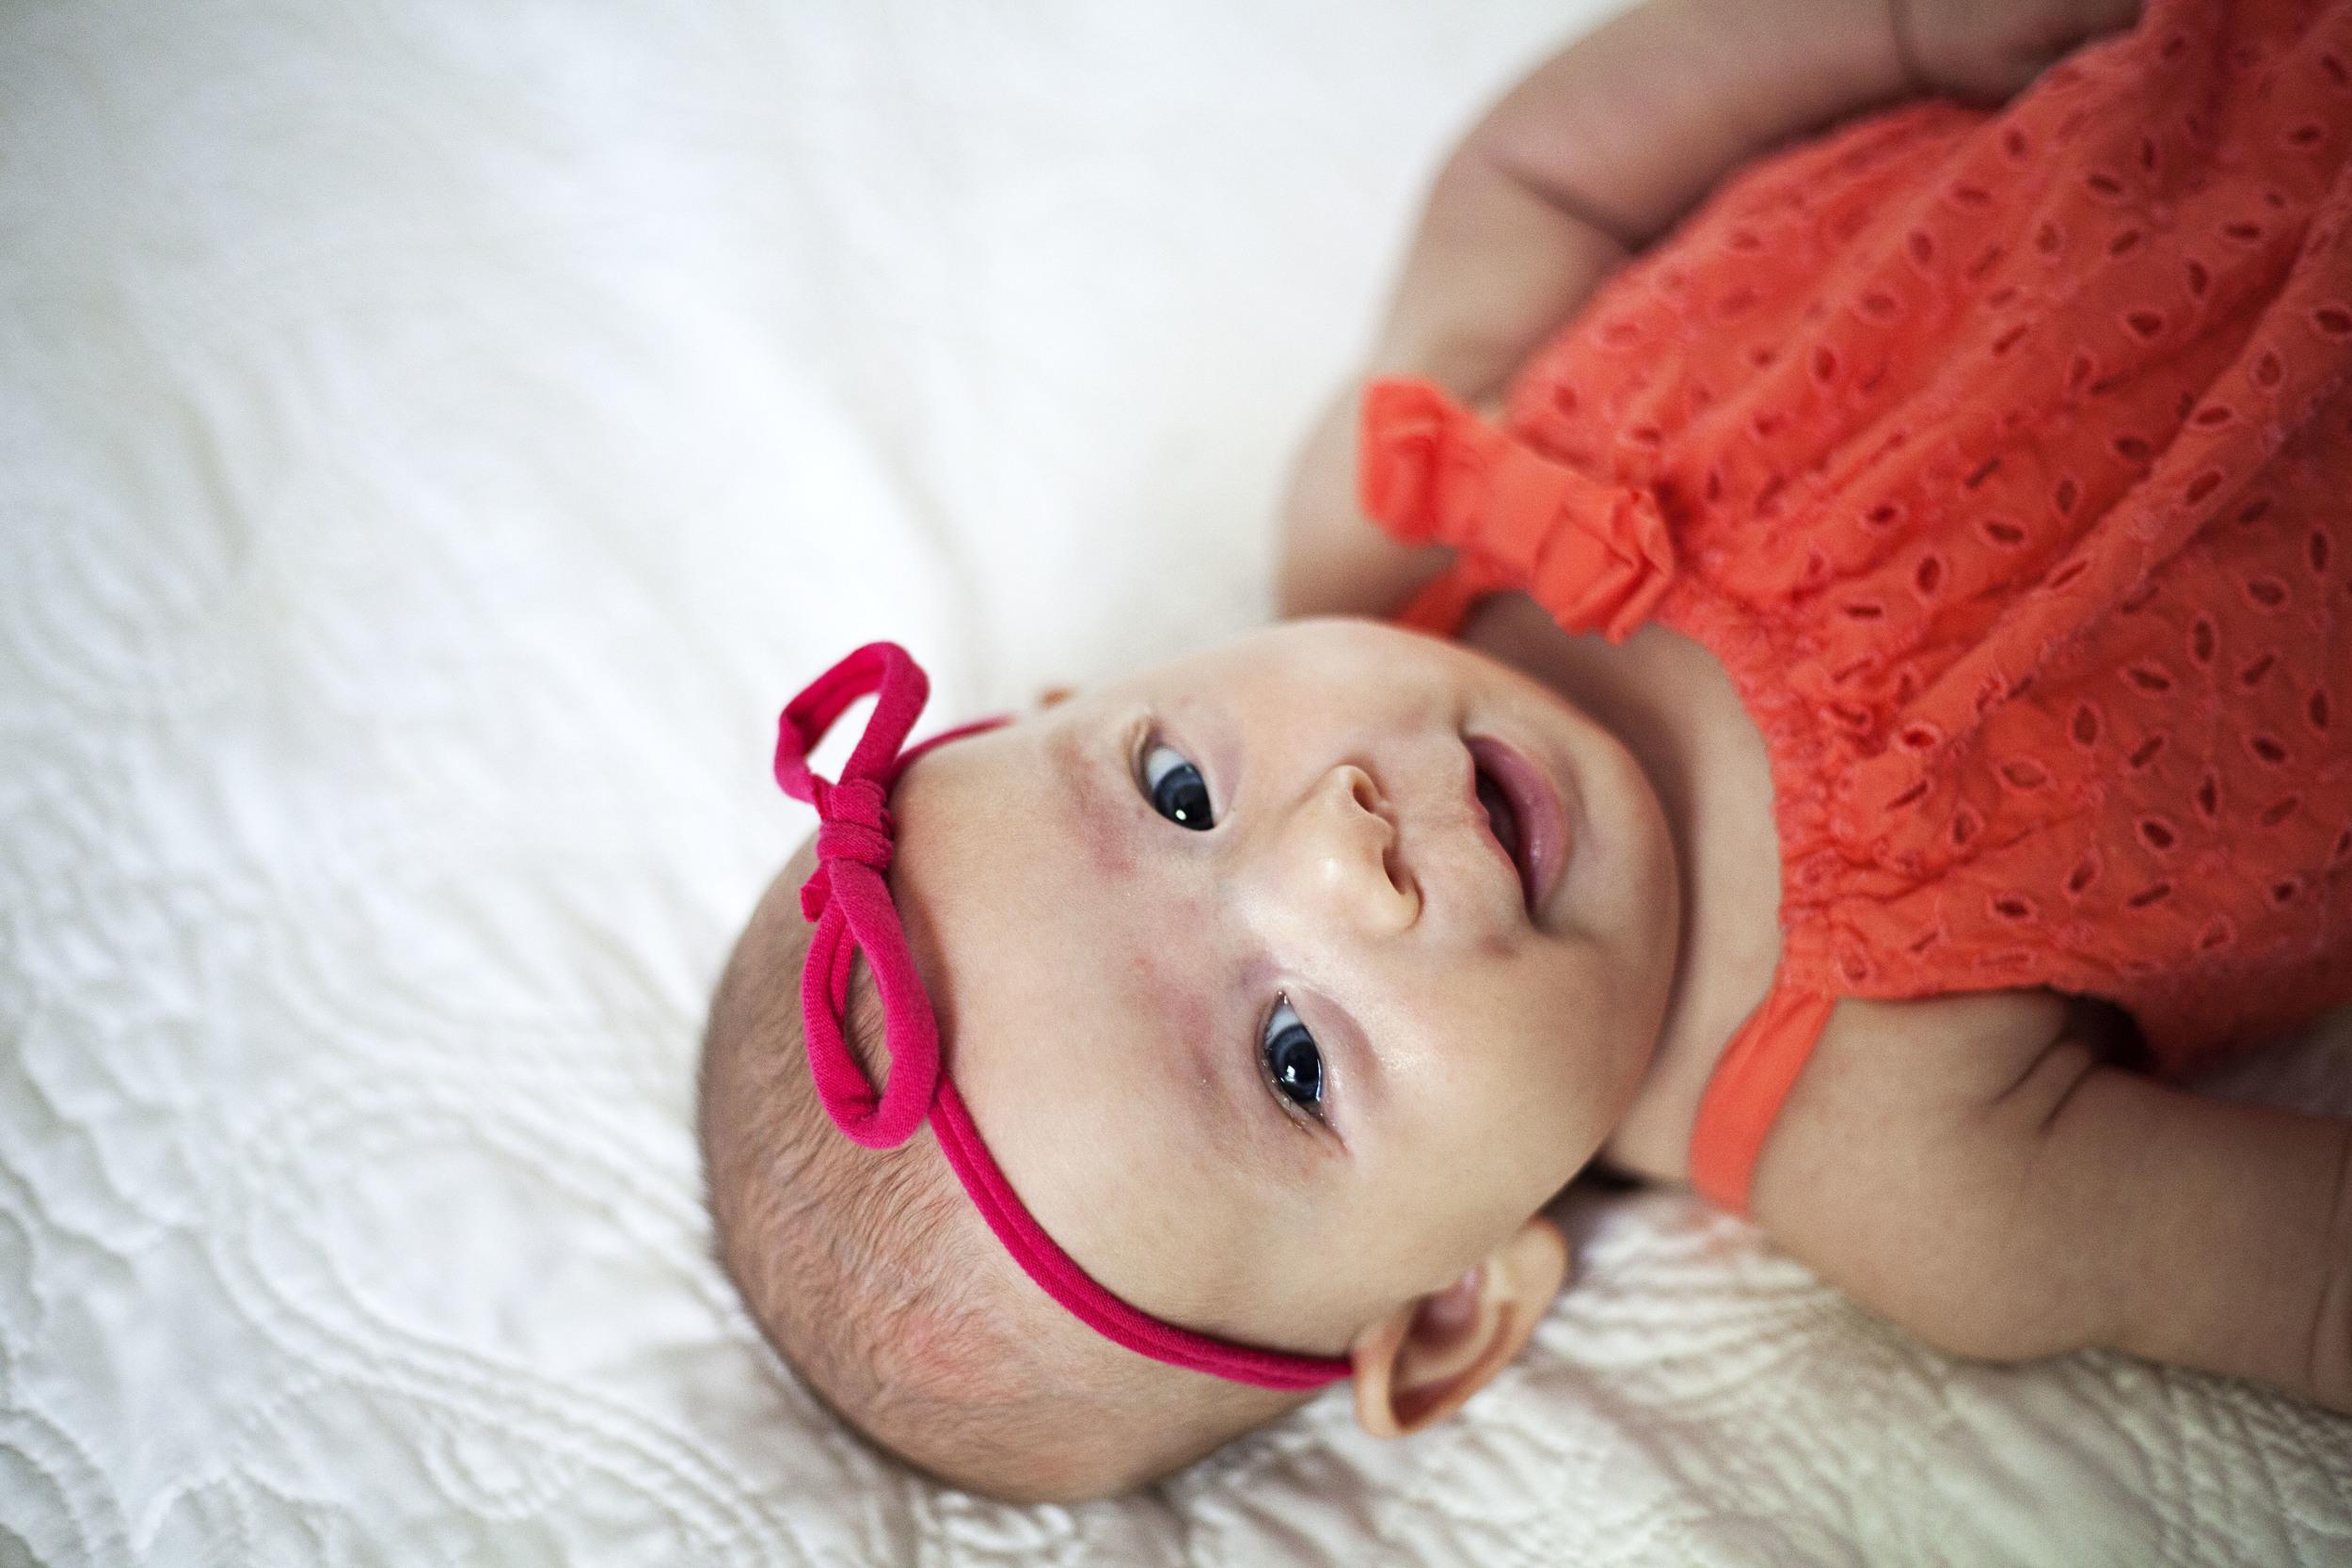 baby headband 5.jpg